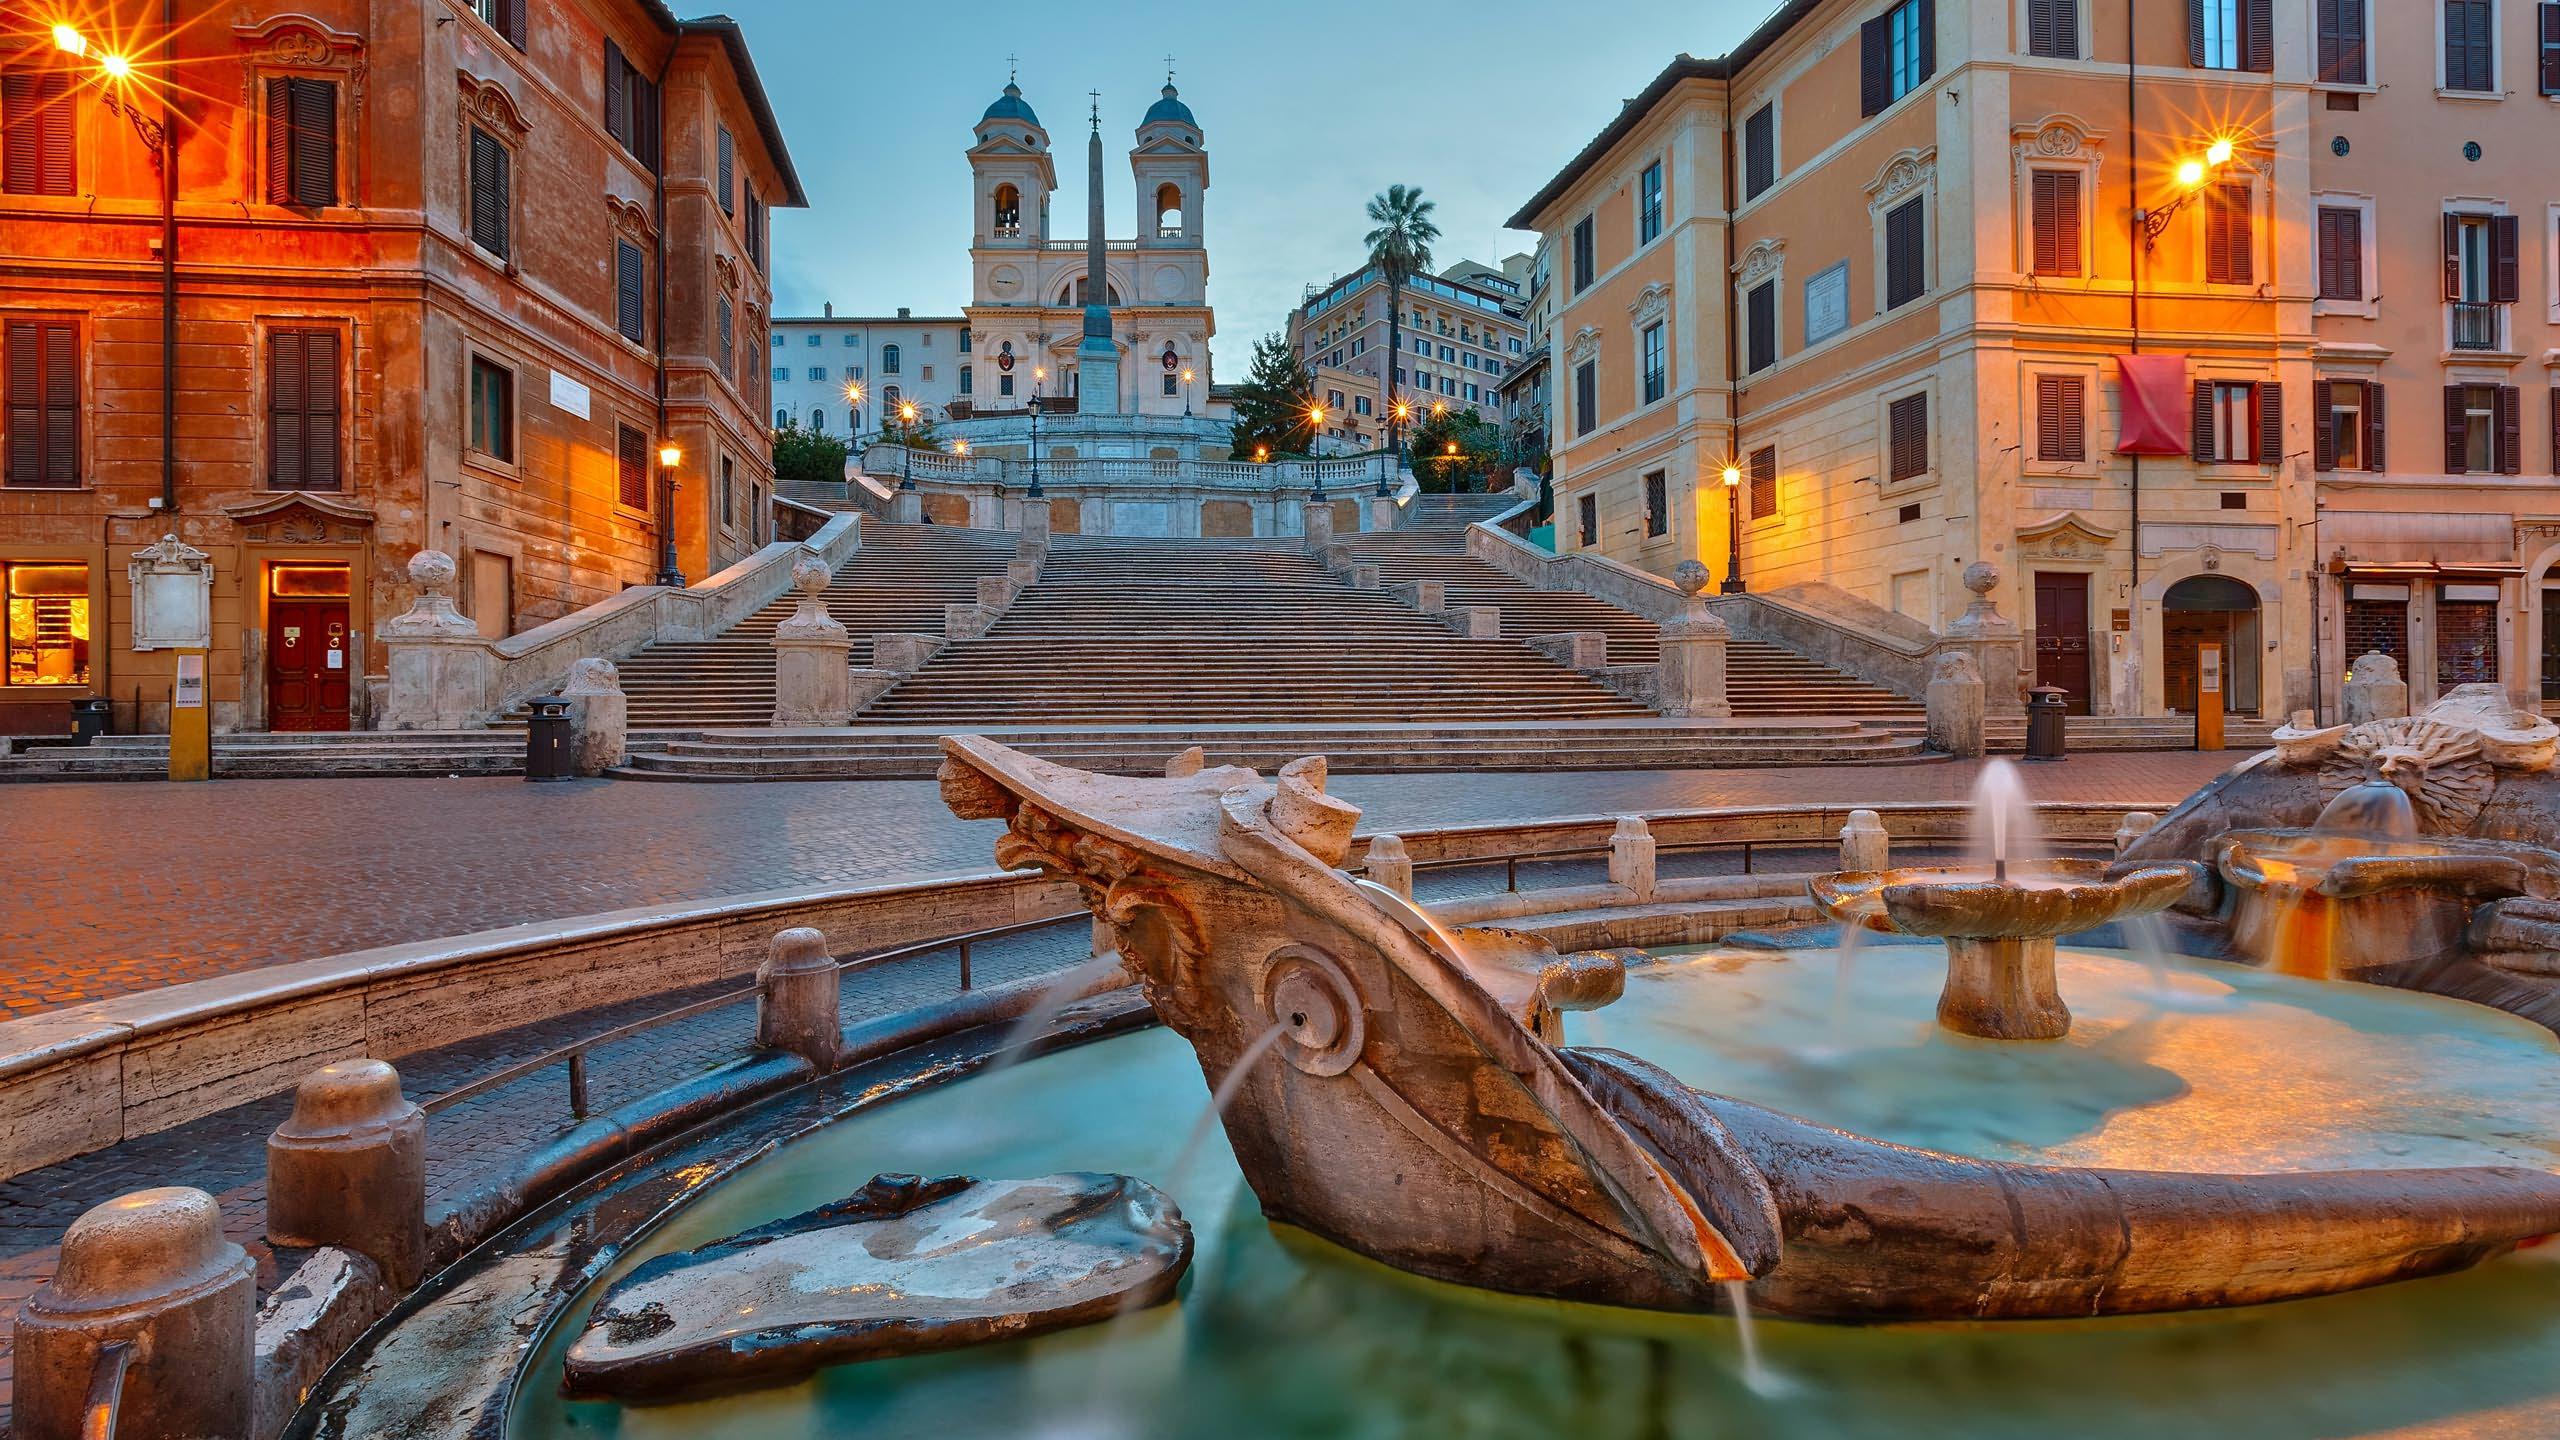 Hotel-Mozart-Rome-spanish-steps